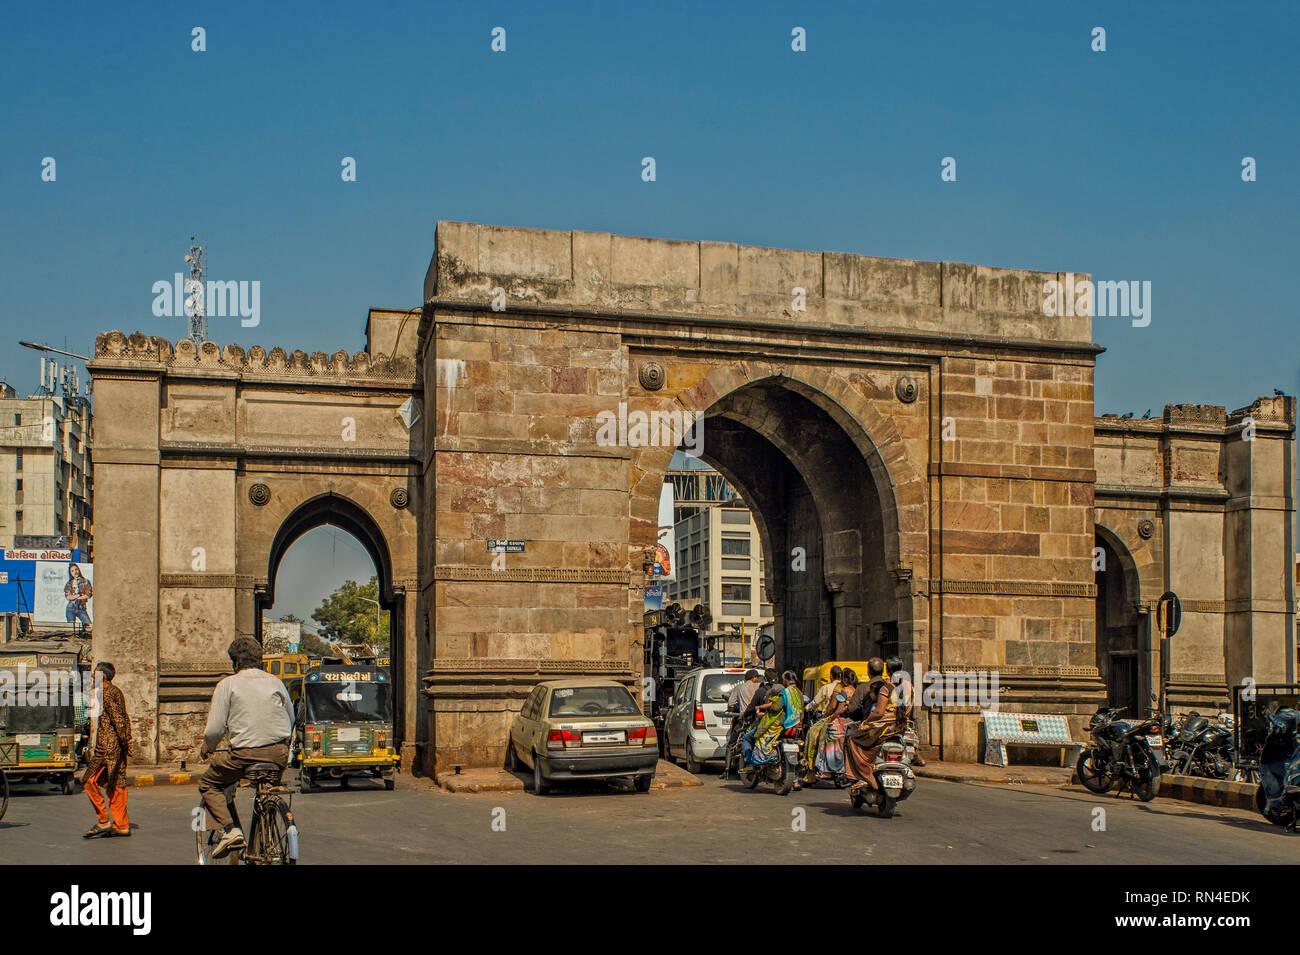 16-Jan-2017-Delhi Darwaja Ahmedabad now Amdavad Gujarat INDIA asia - Stock Image